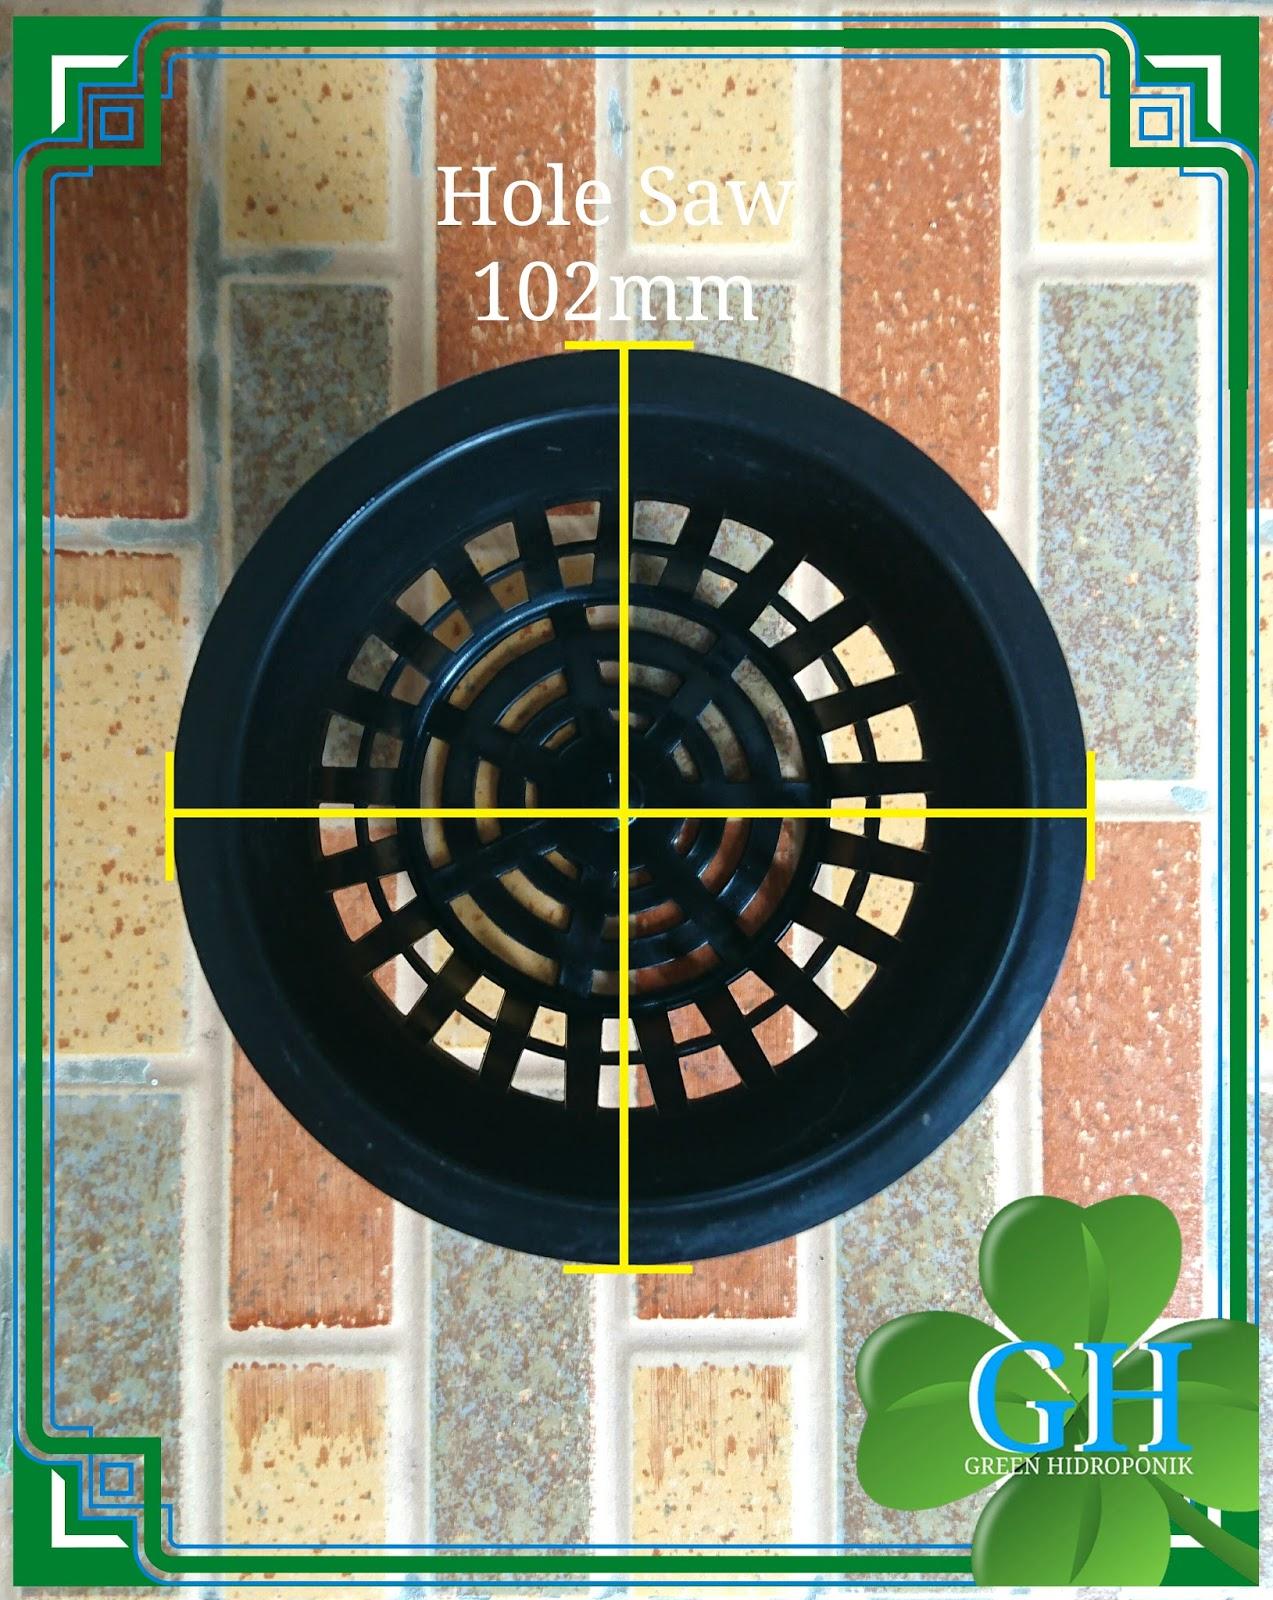 Netpot Hidroponik Net Pot Besar Atas 11cm 10cm Tinggi Hitam 5cm Gambar Produk Lainnya